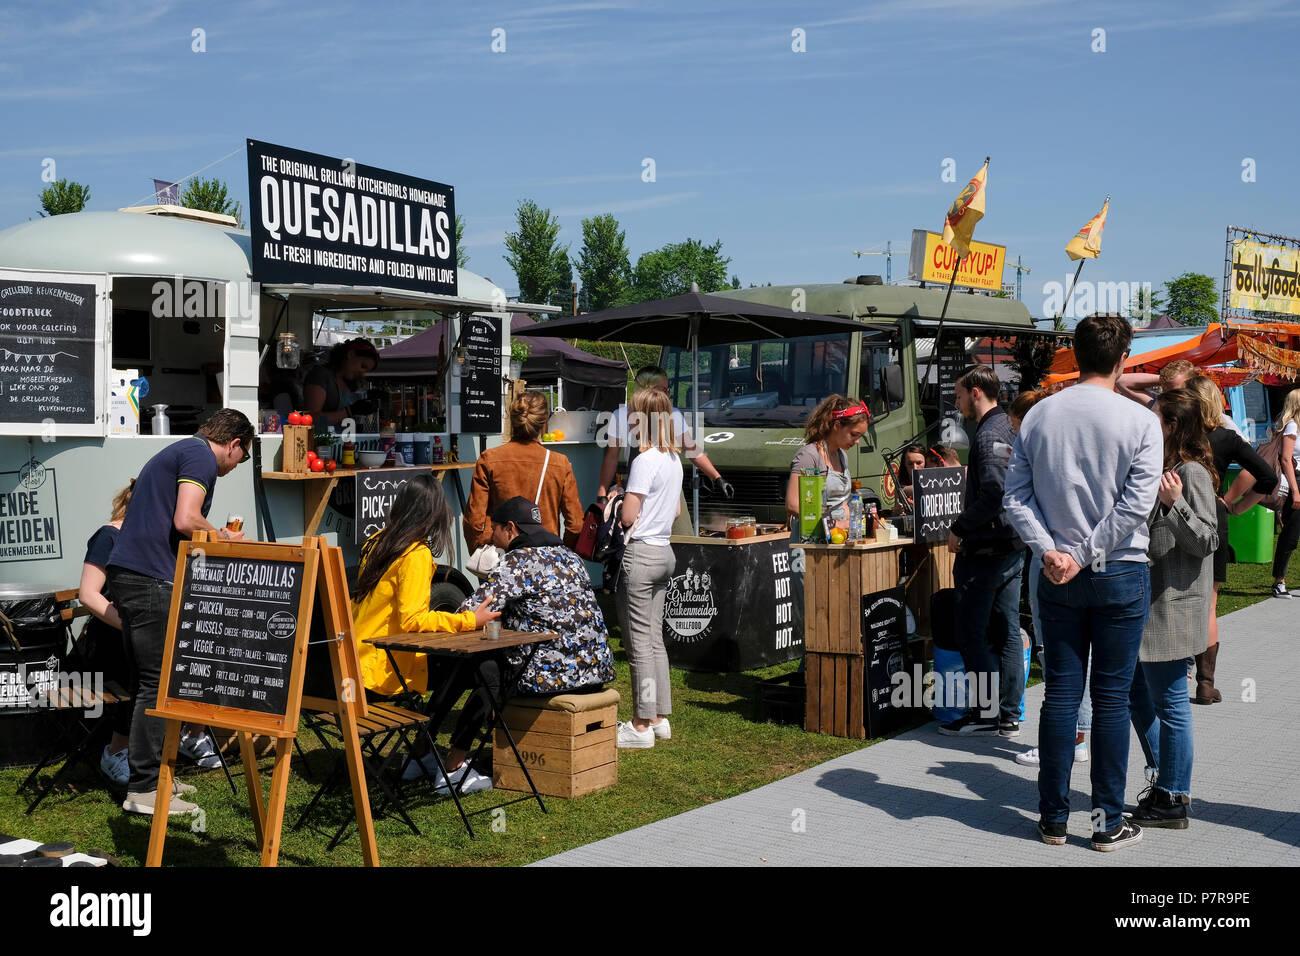 Rollende Keukens Amsterdam : Food festival de rollende keukens die rollende küche in amsterdam